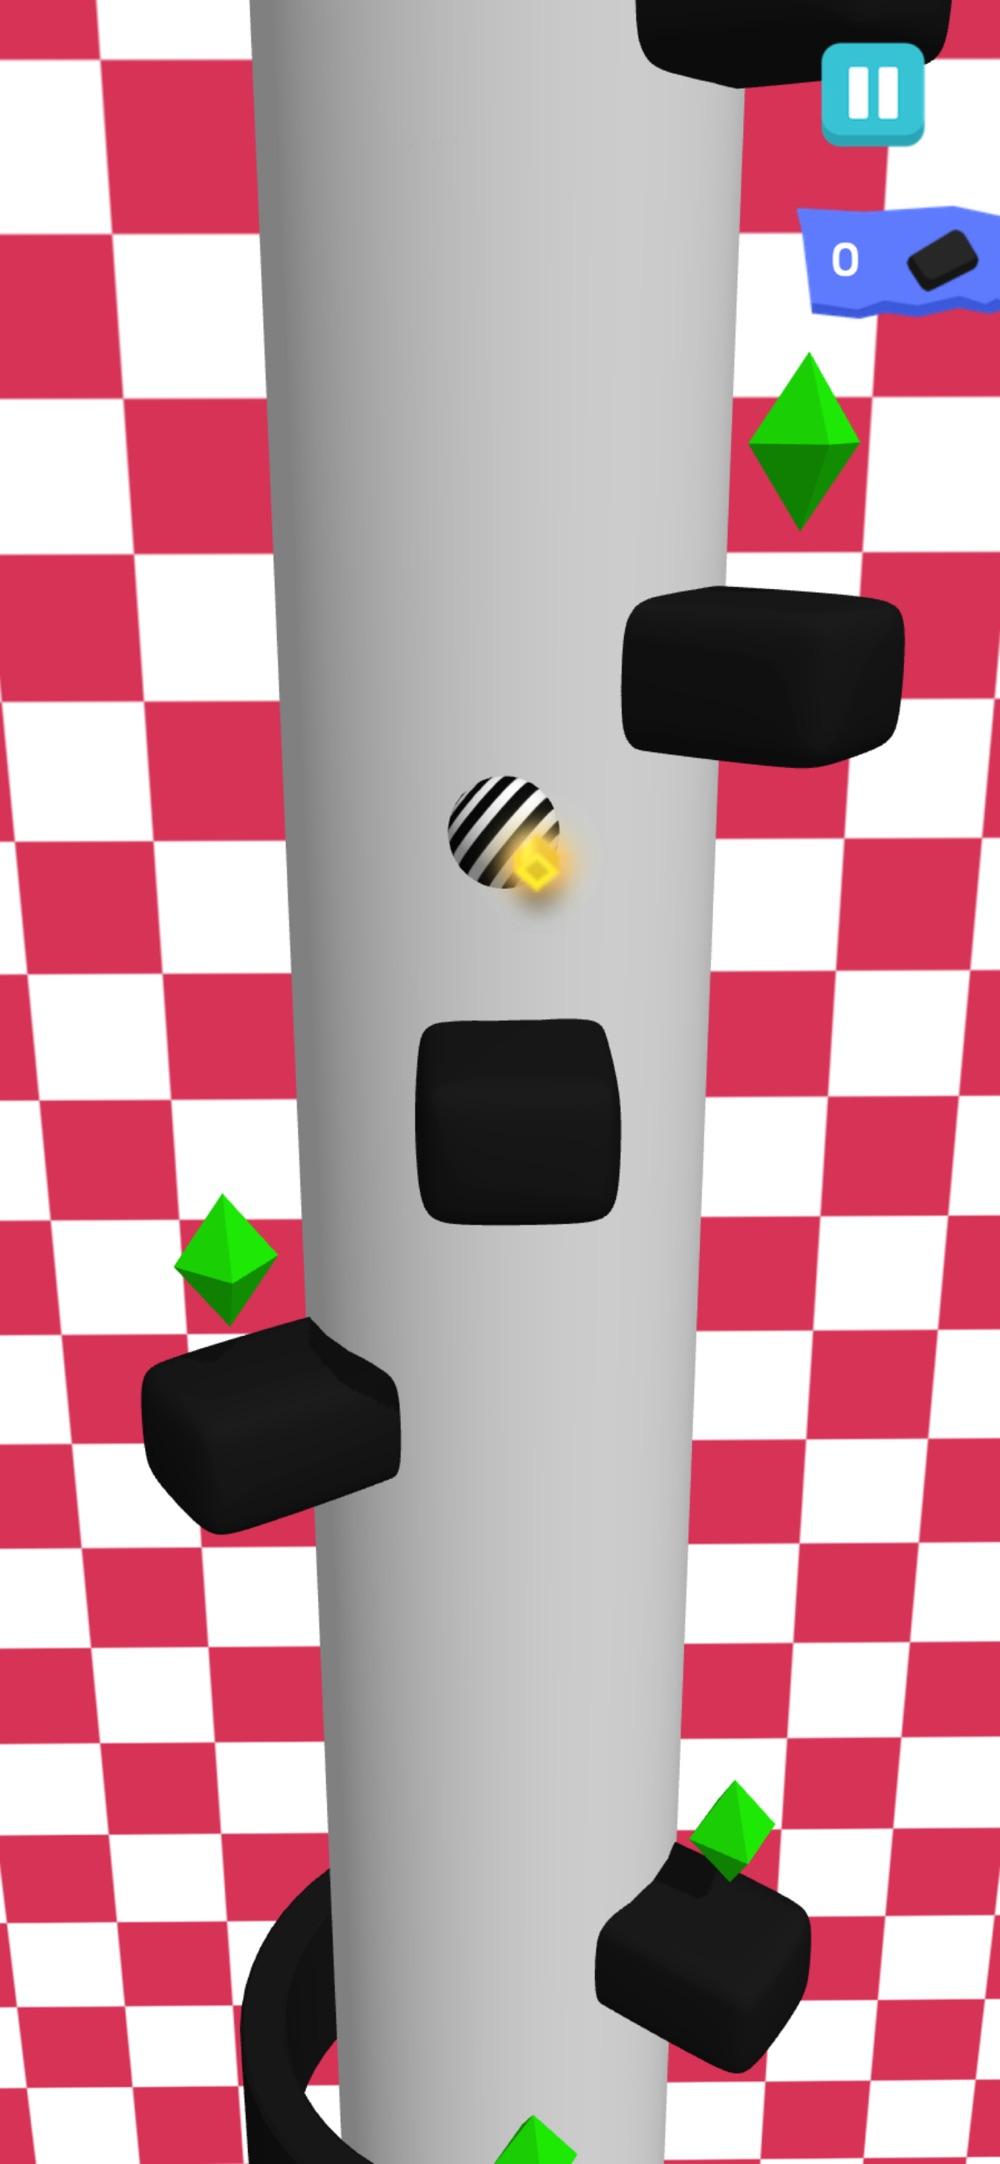 Rush Down Helix Jump cube hack tool